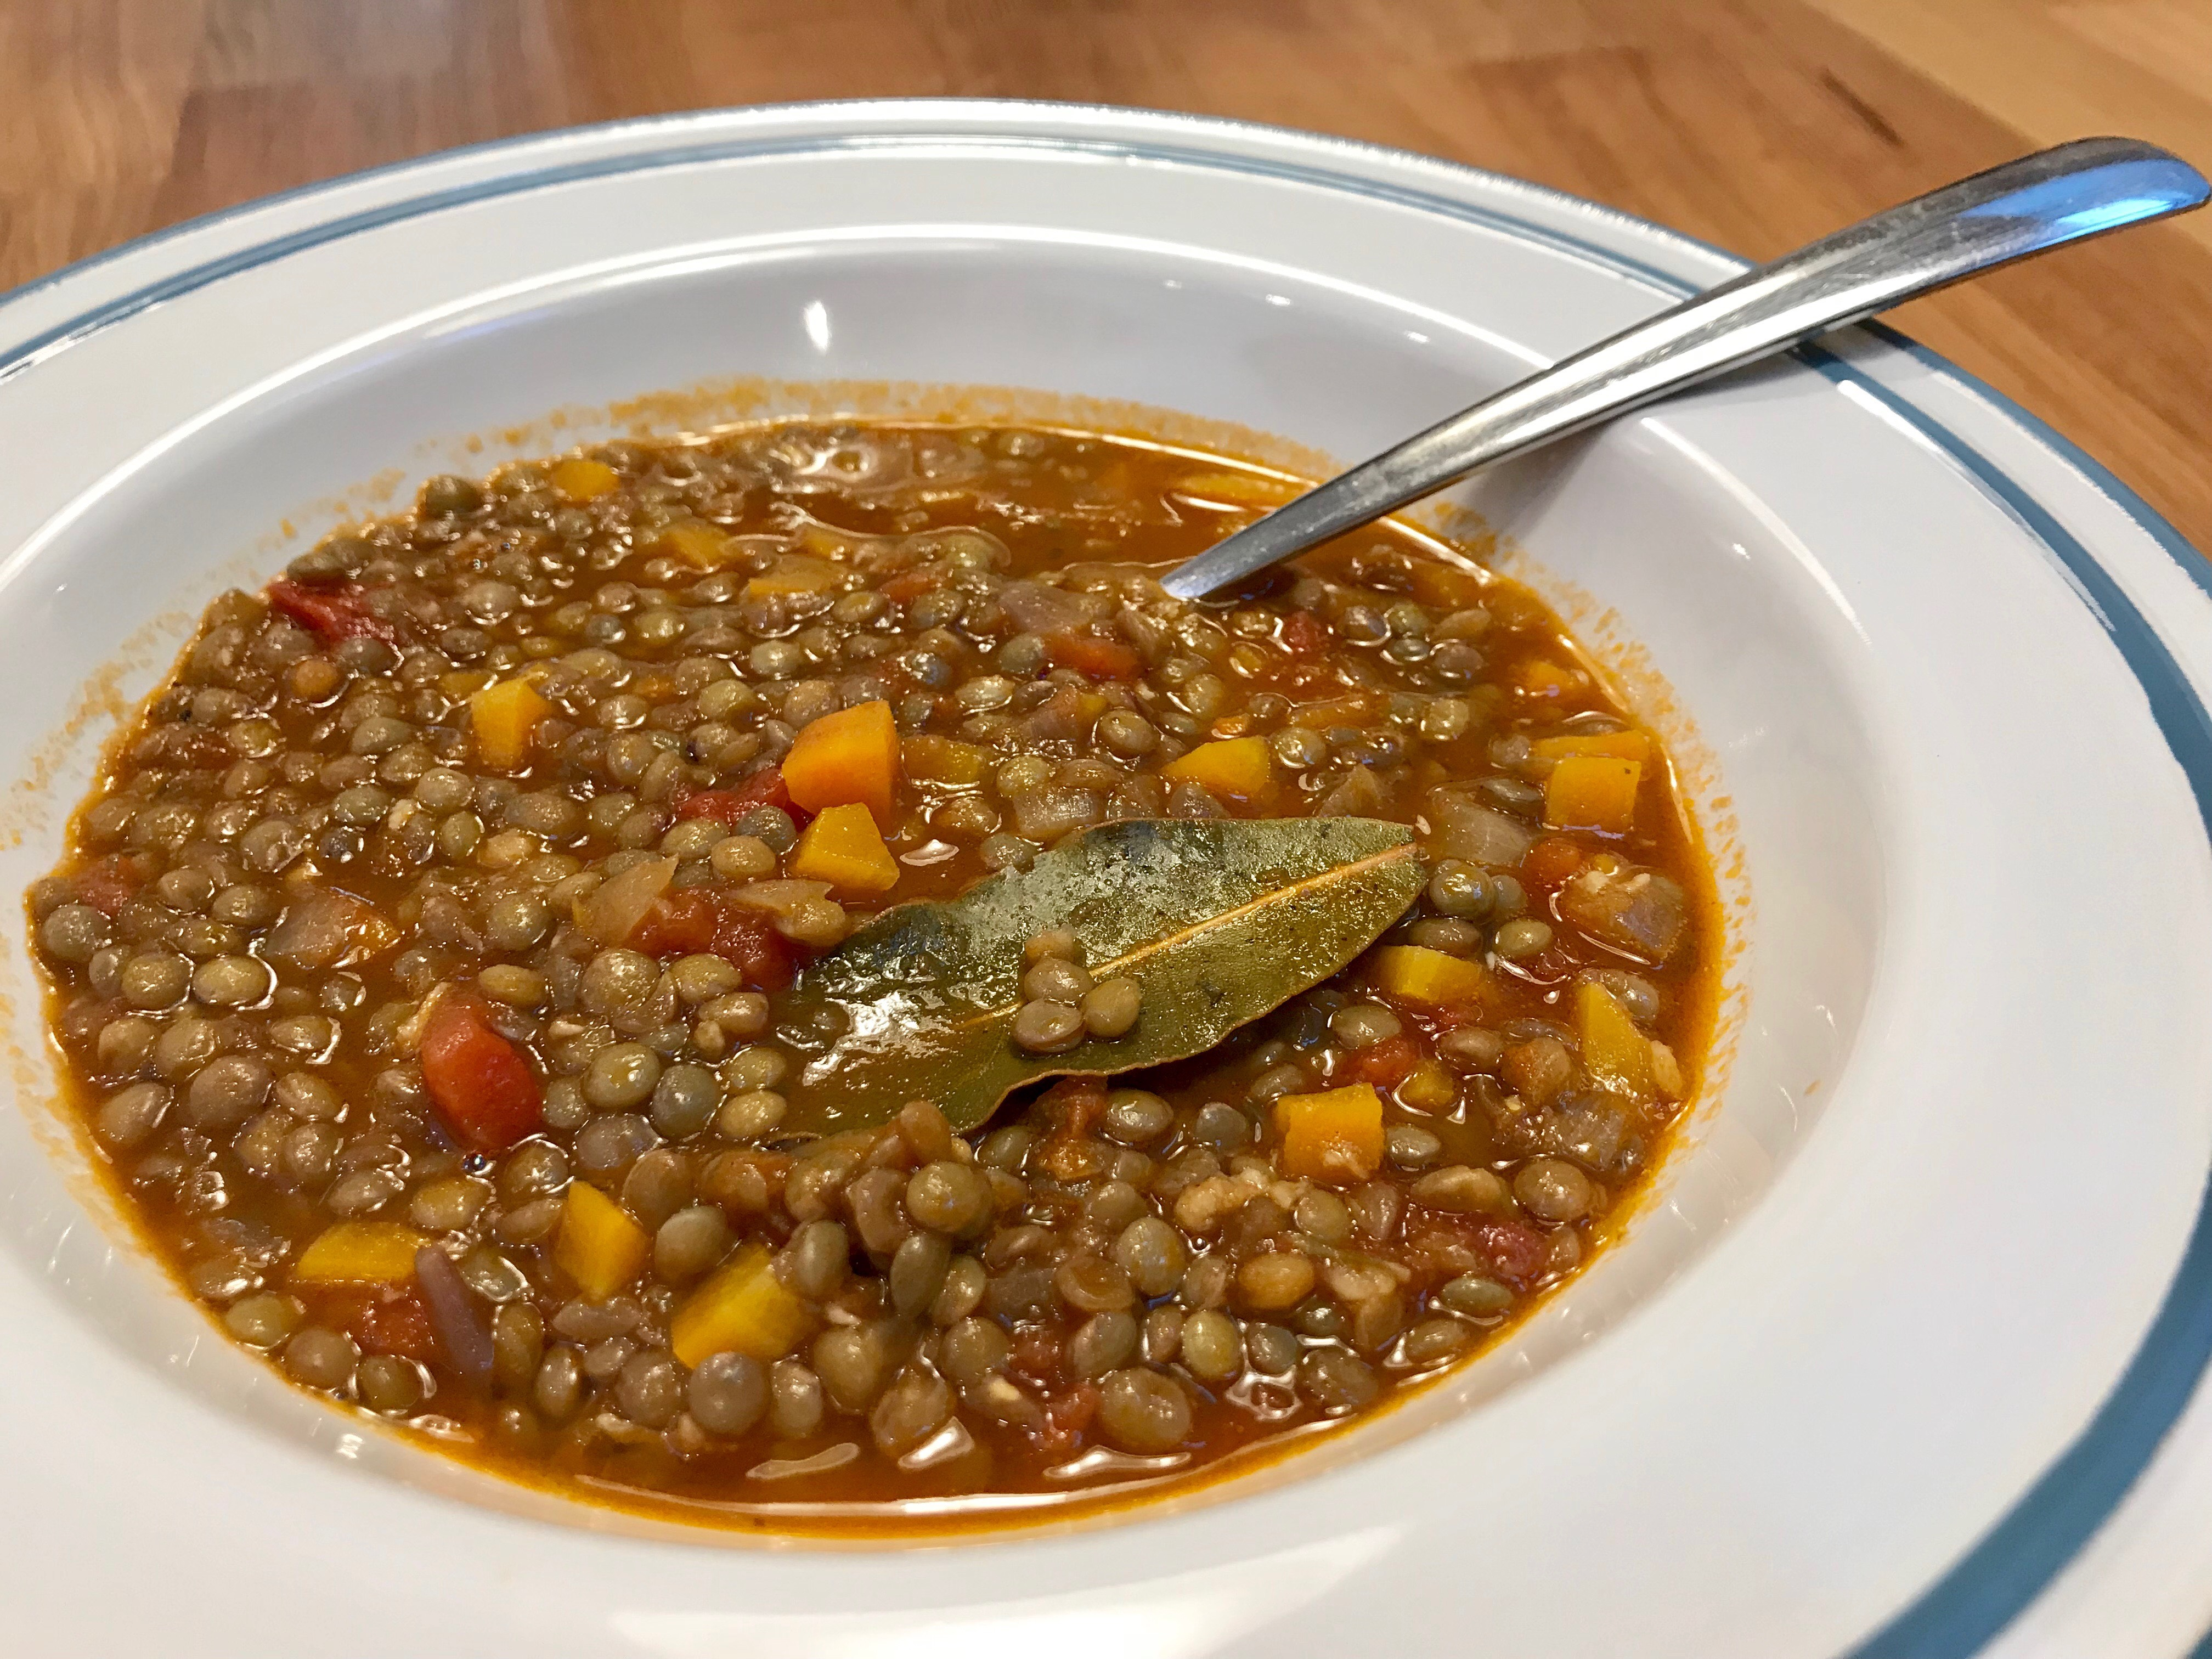 Čočková polévka - soupa fakes